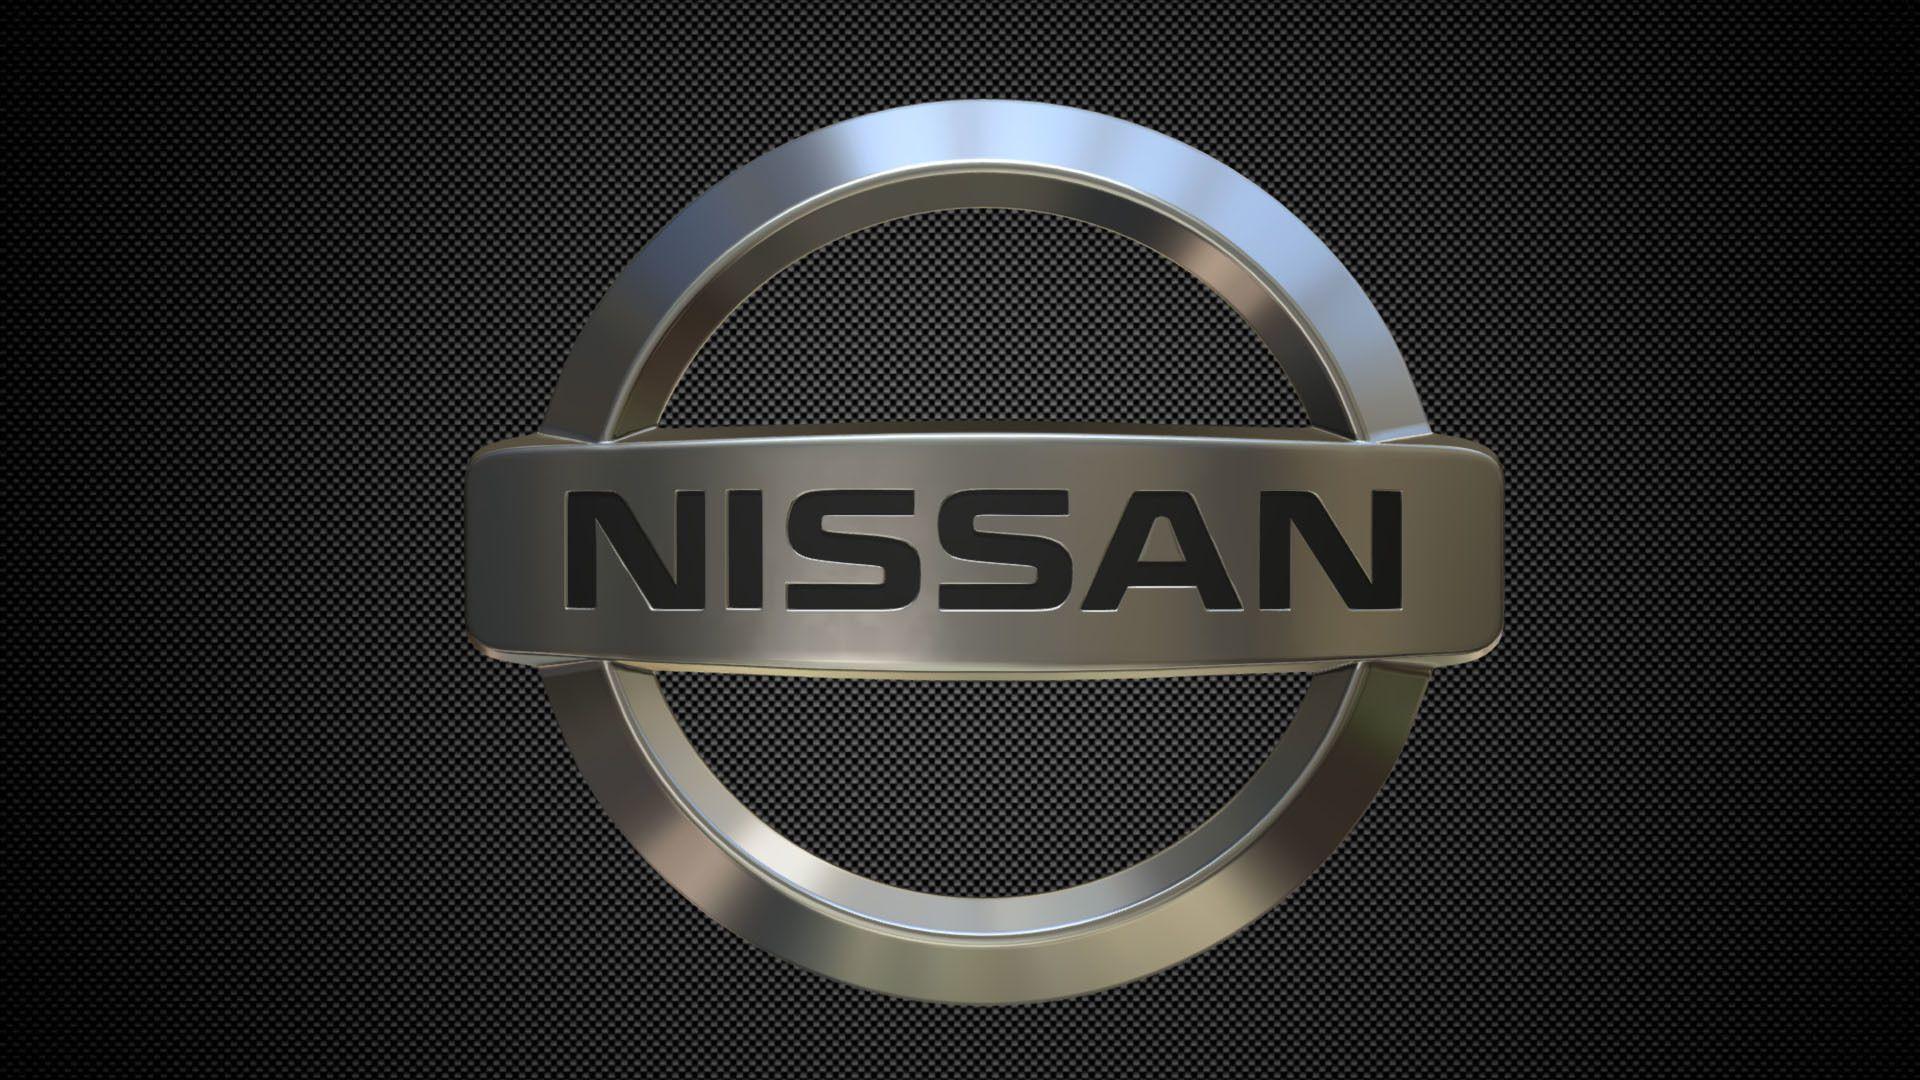 Nissan Logo No Background desktop